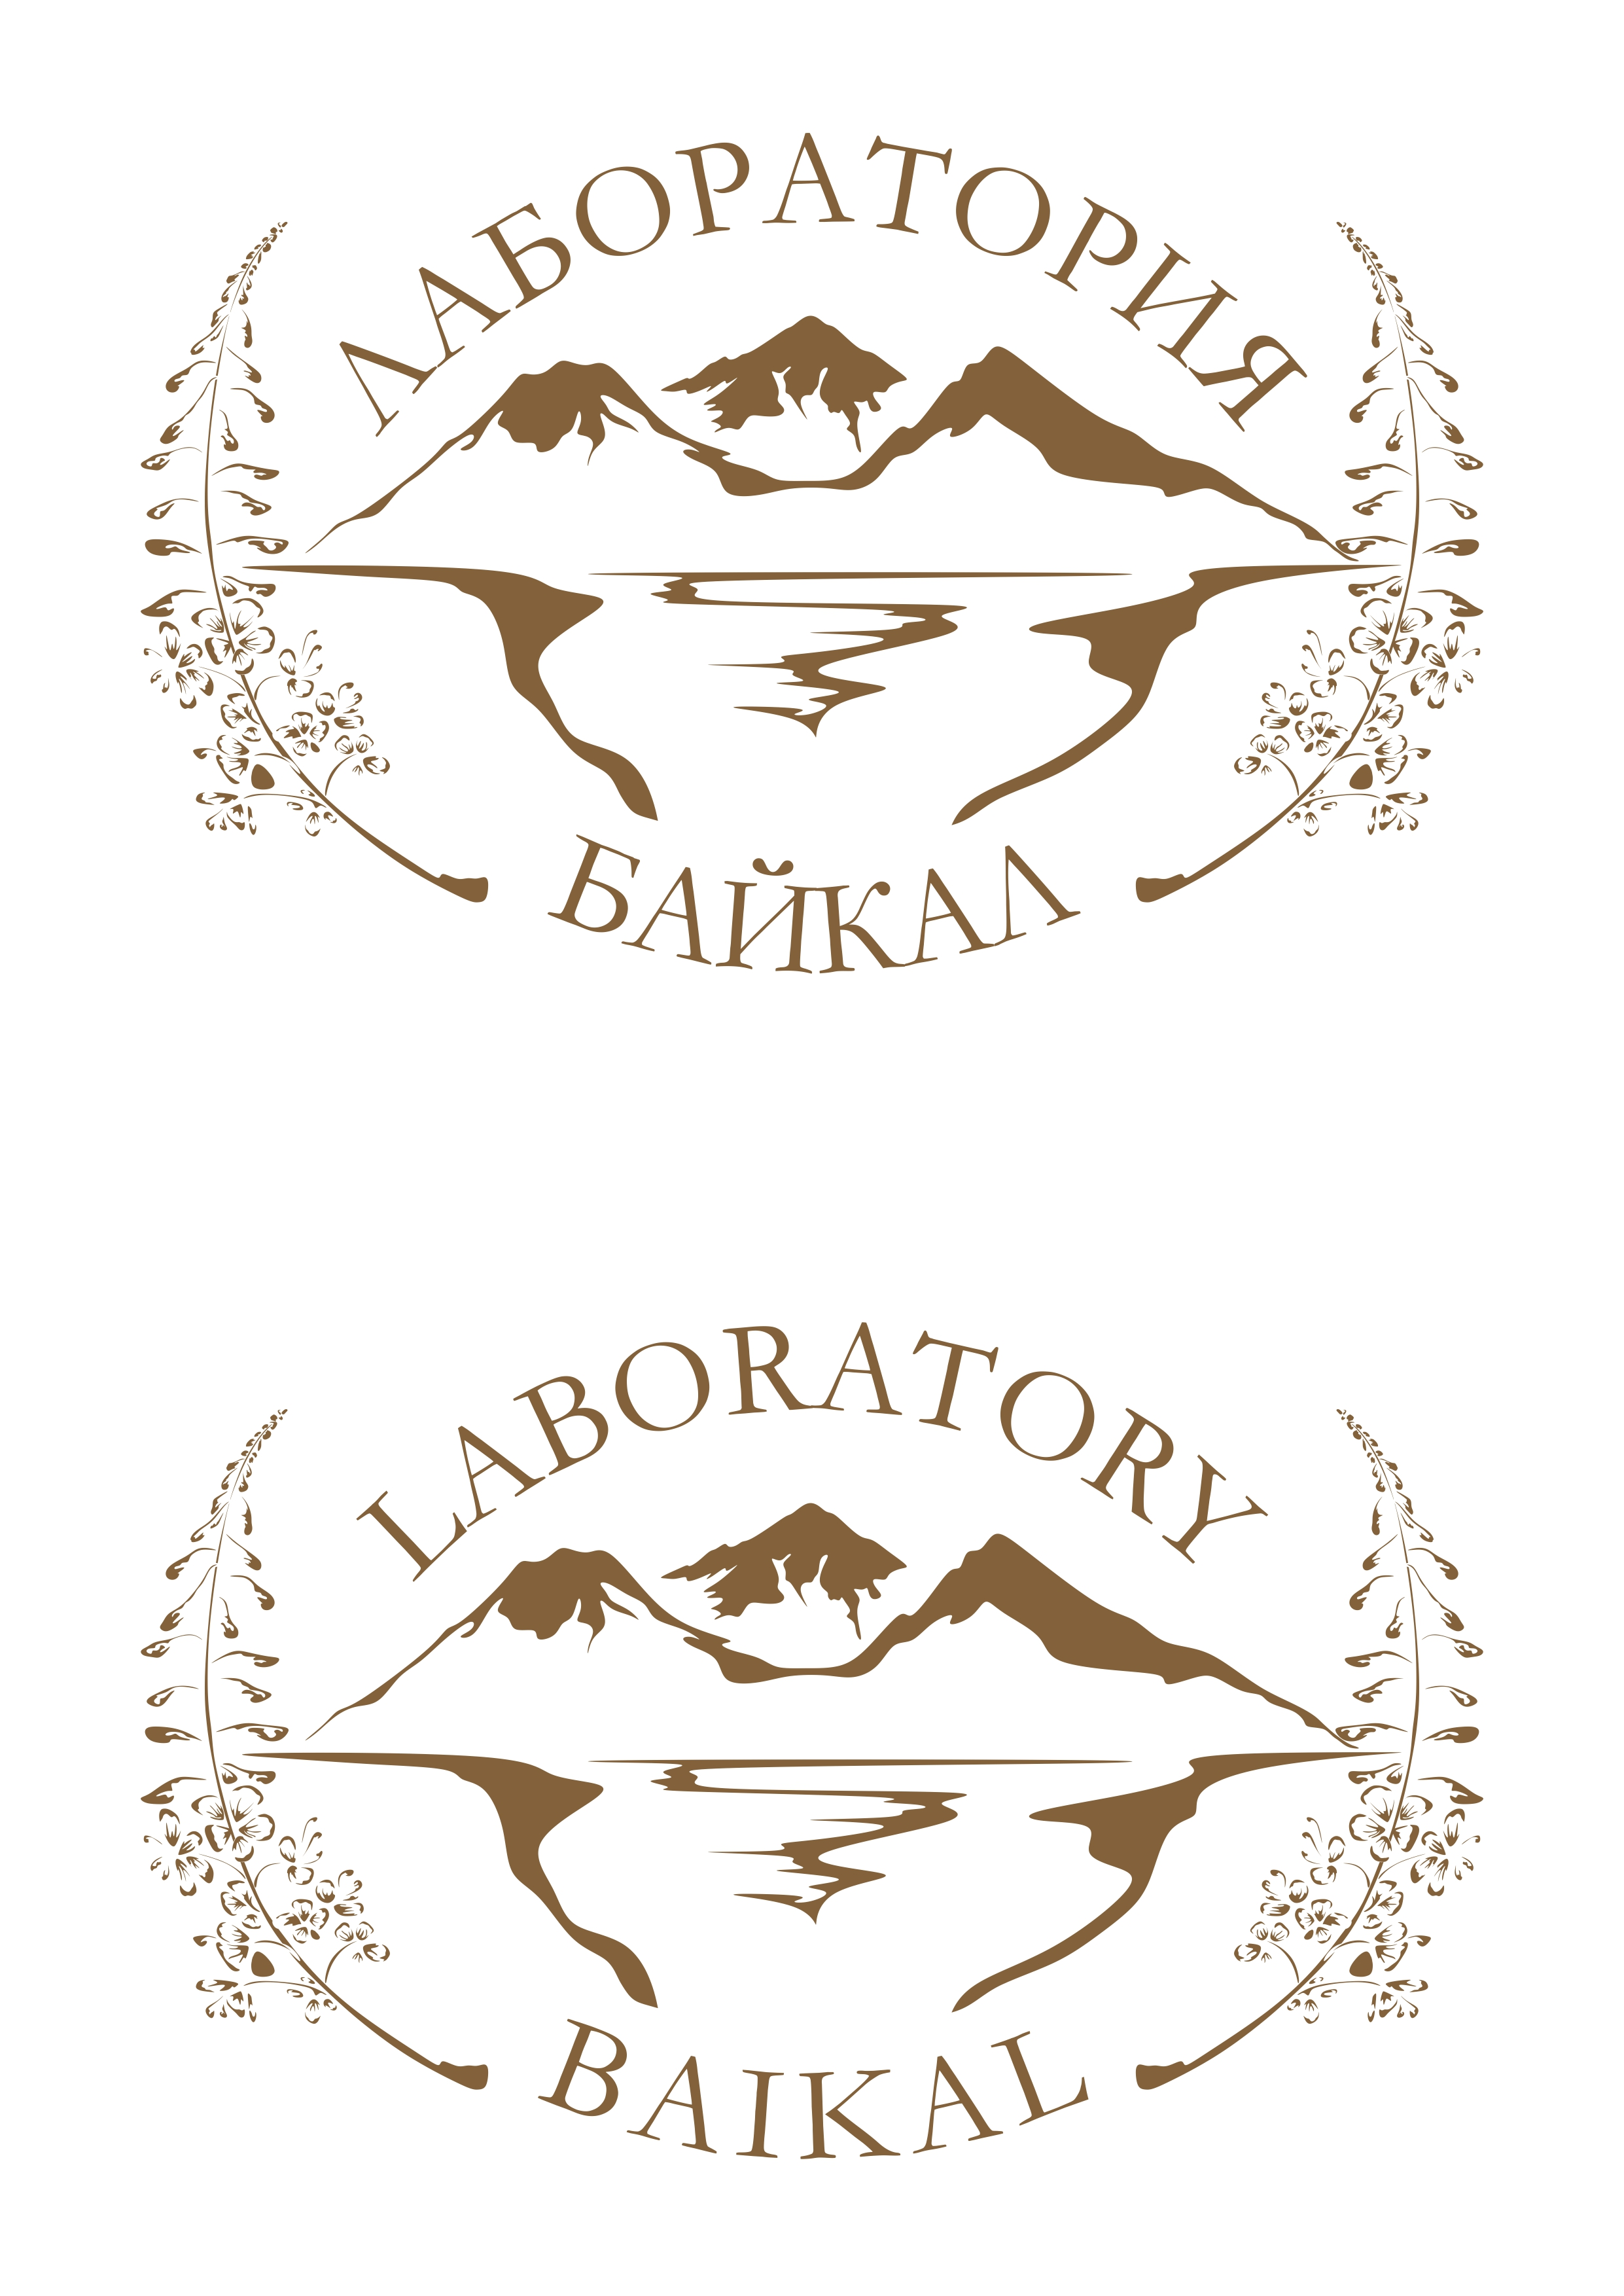 Разработка логотипа торговой марки фото f_19559686f4474dd0.jpg